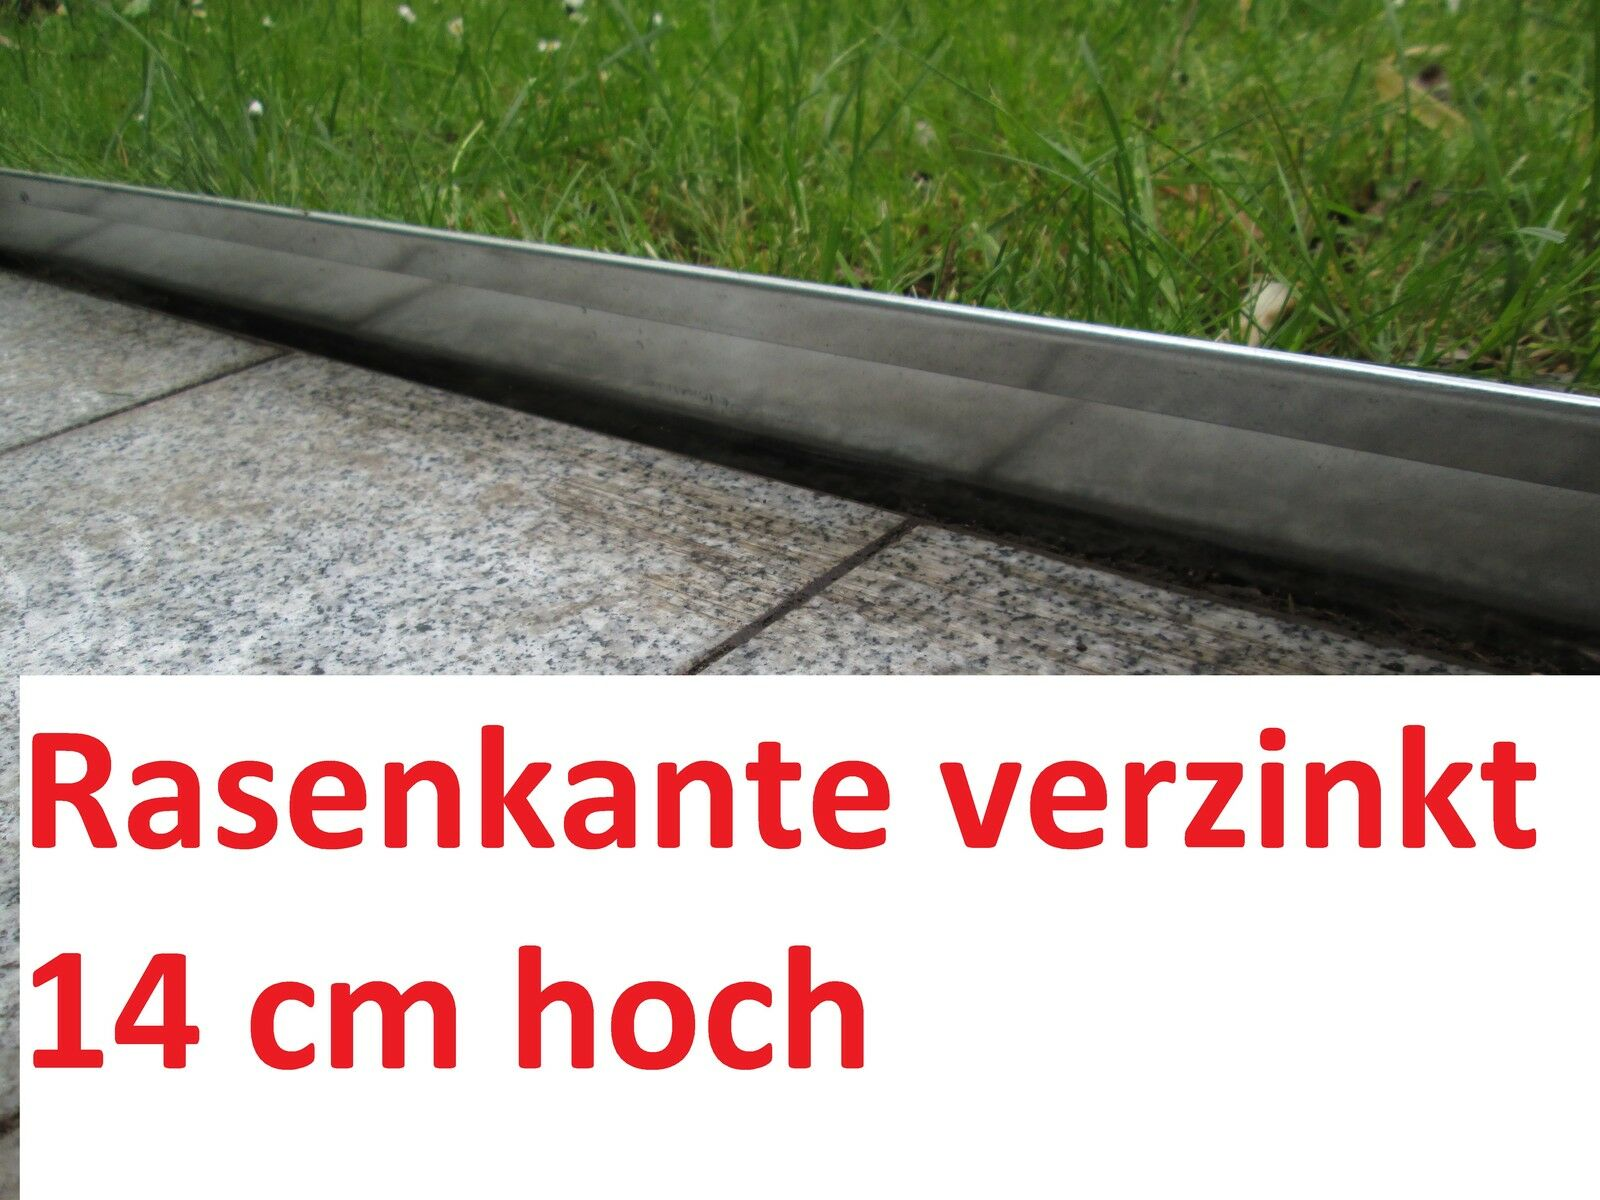 15 Meter Rasenkante Metall 14 cm hoch BeeteinfasSolg Rasenkante Mähumrandung